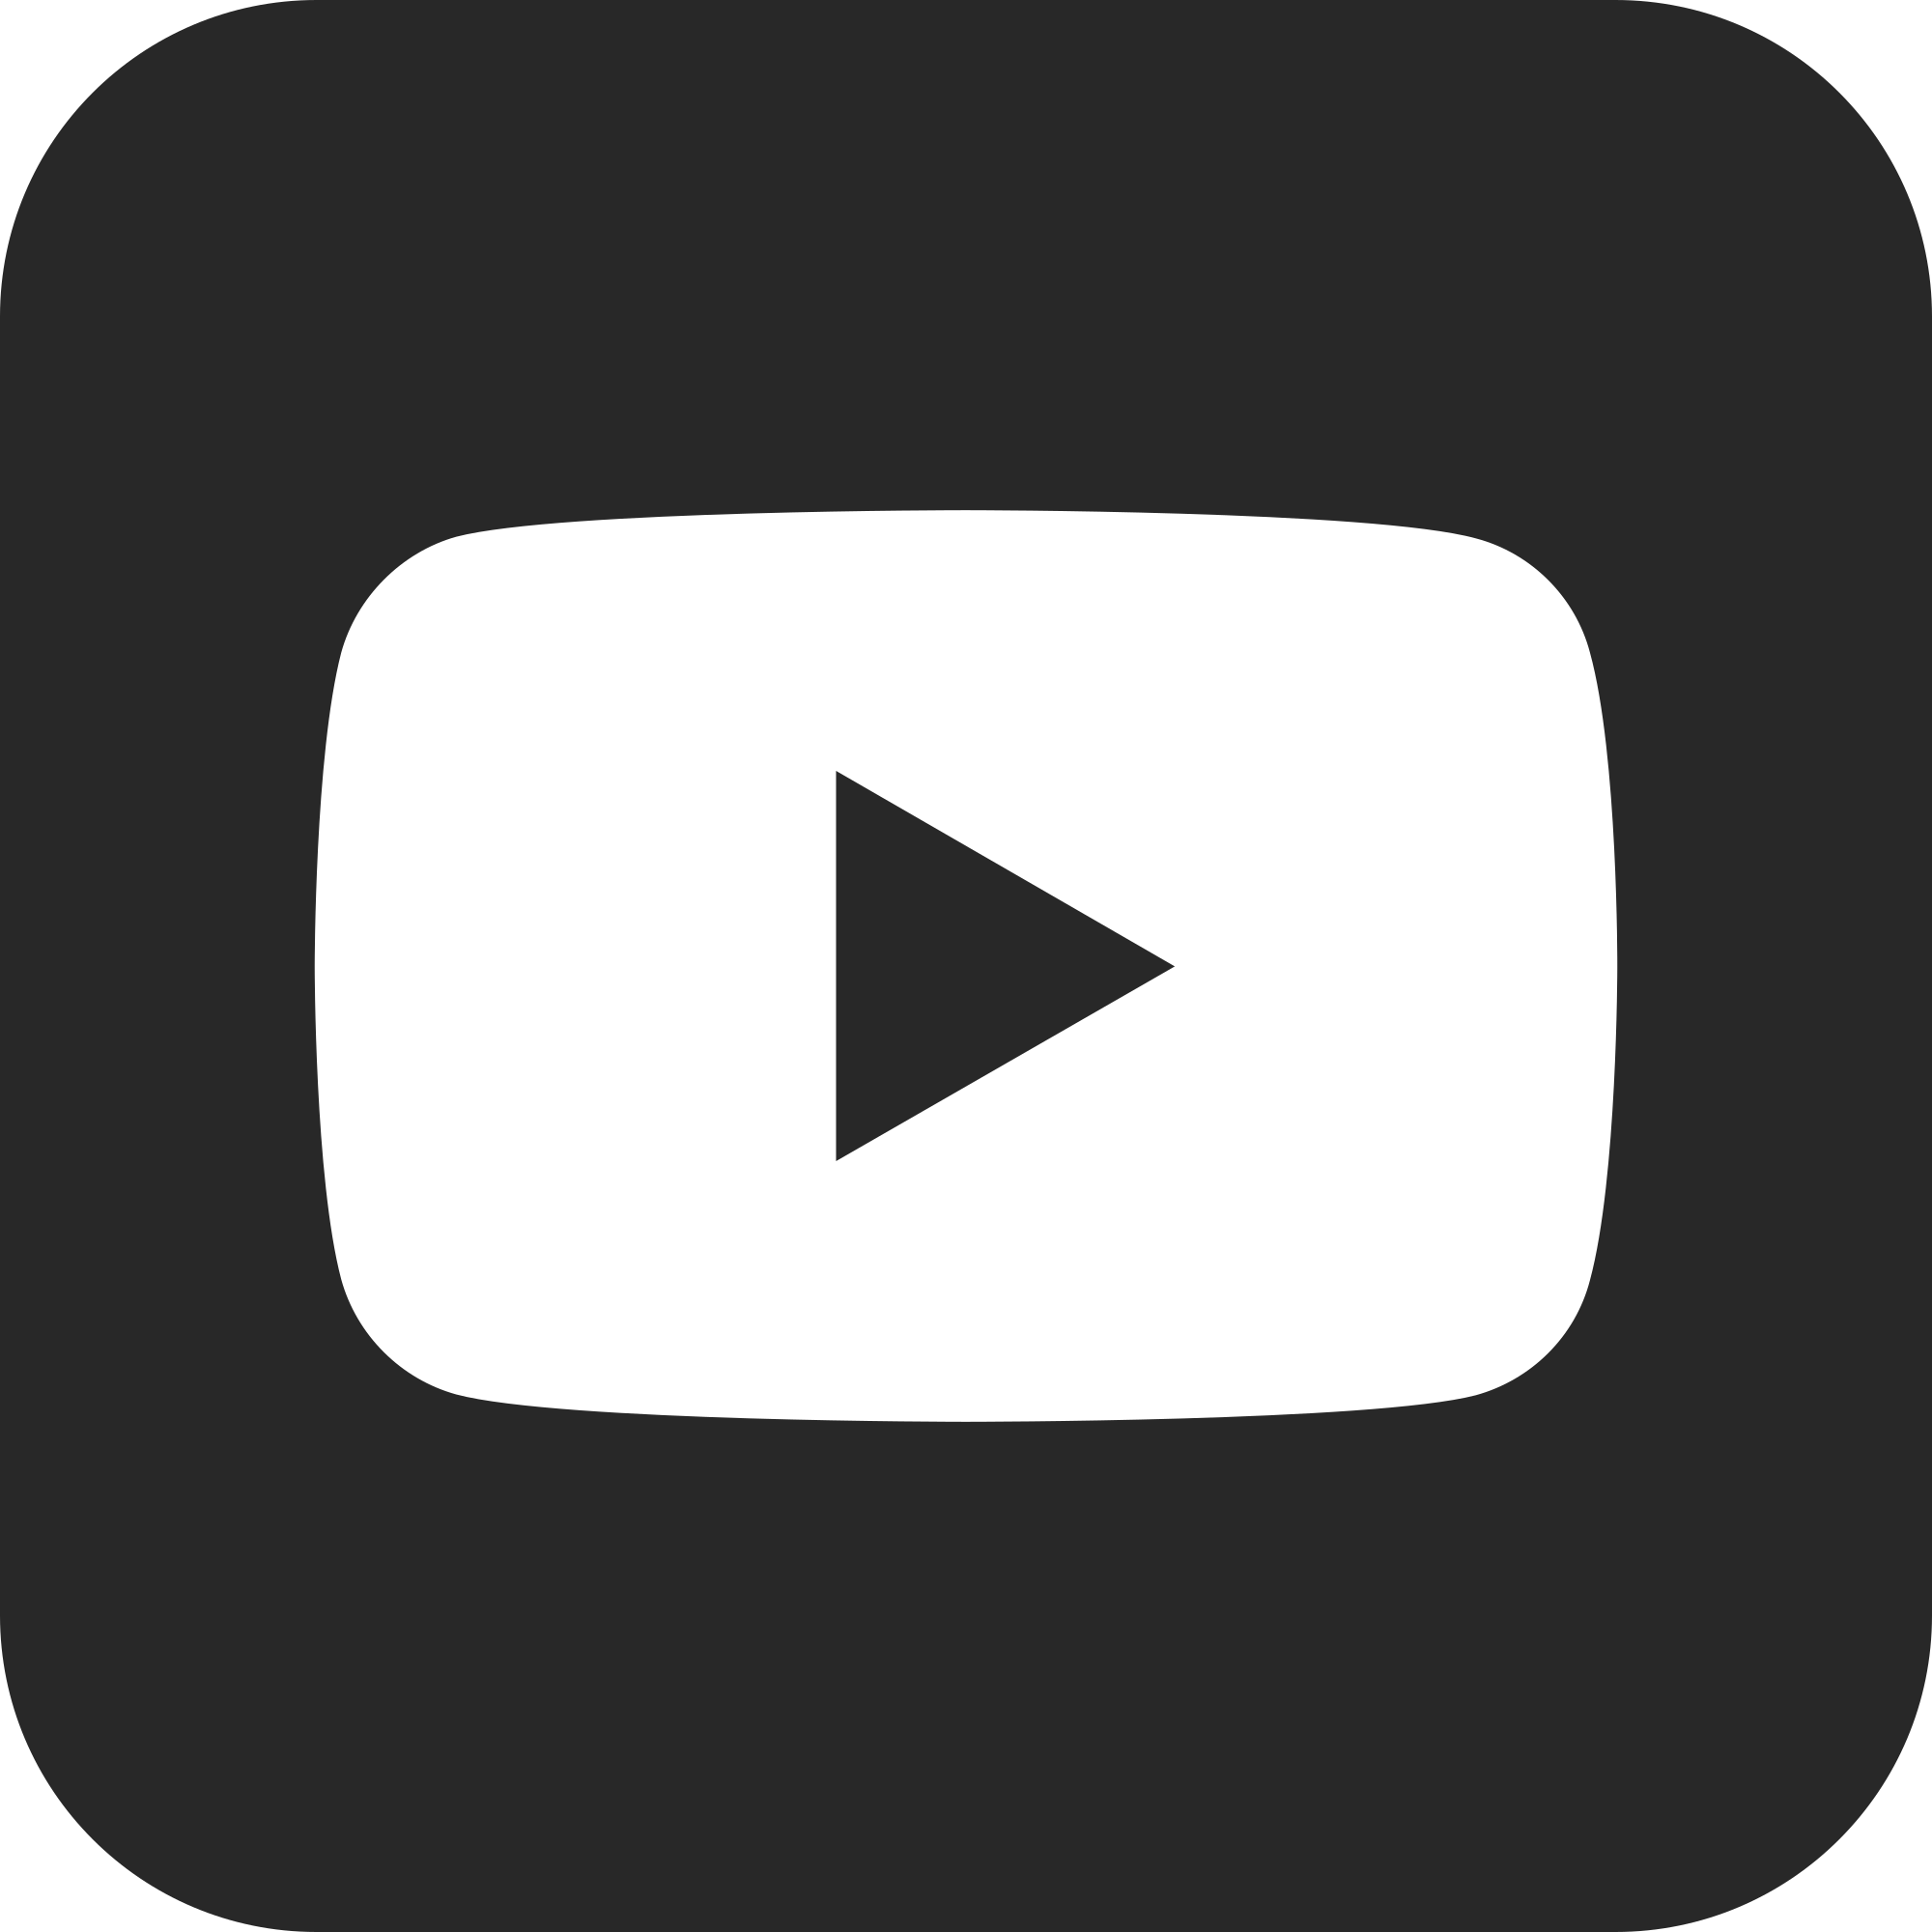 Youtube Icon Png White #161214.